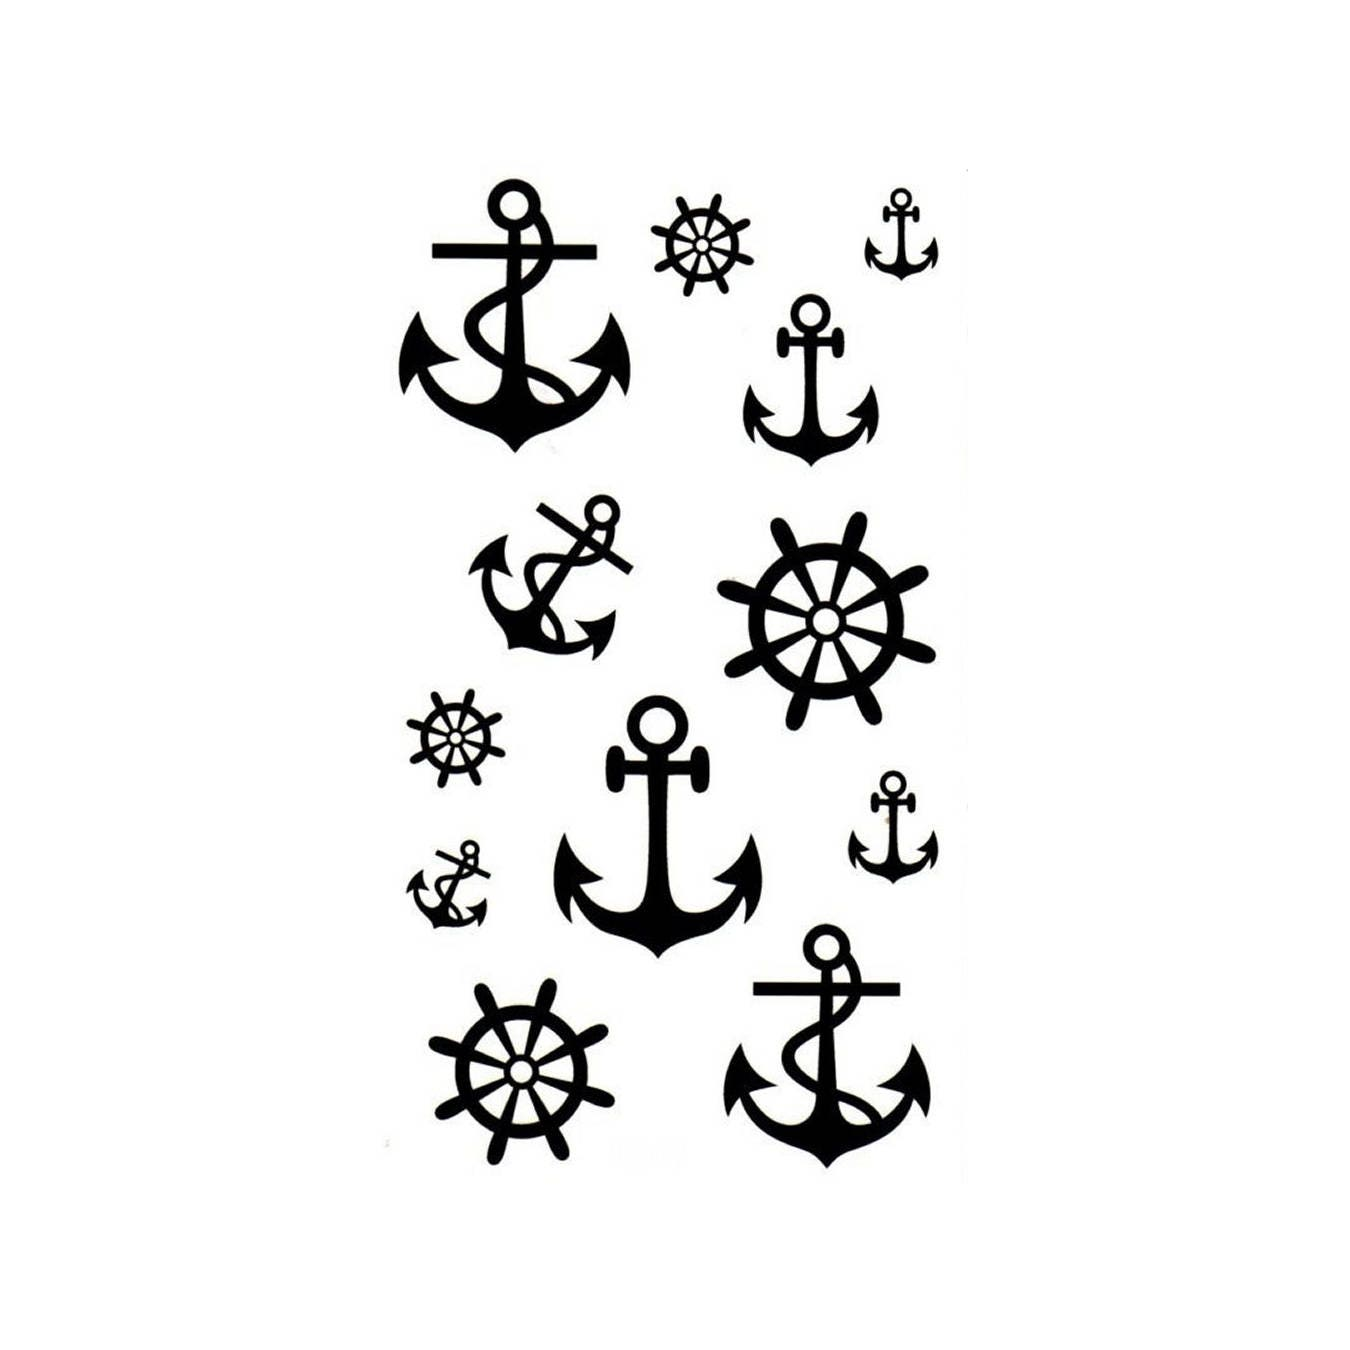 a9841e0c52e81 Waterproof Temporary Tattoos Transfer Anchor Rudder Celebrity | Etsy